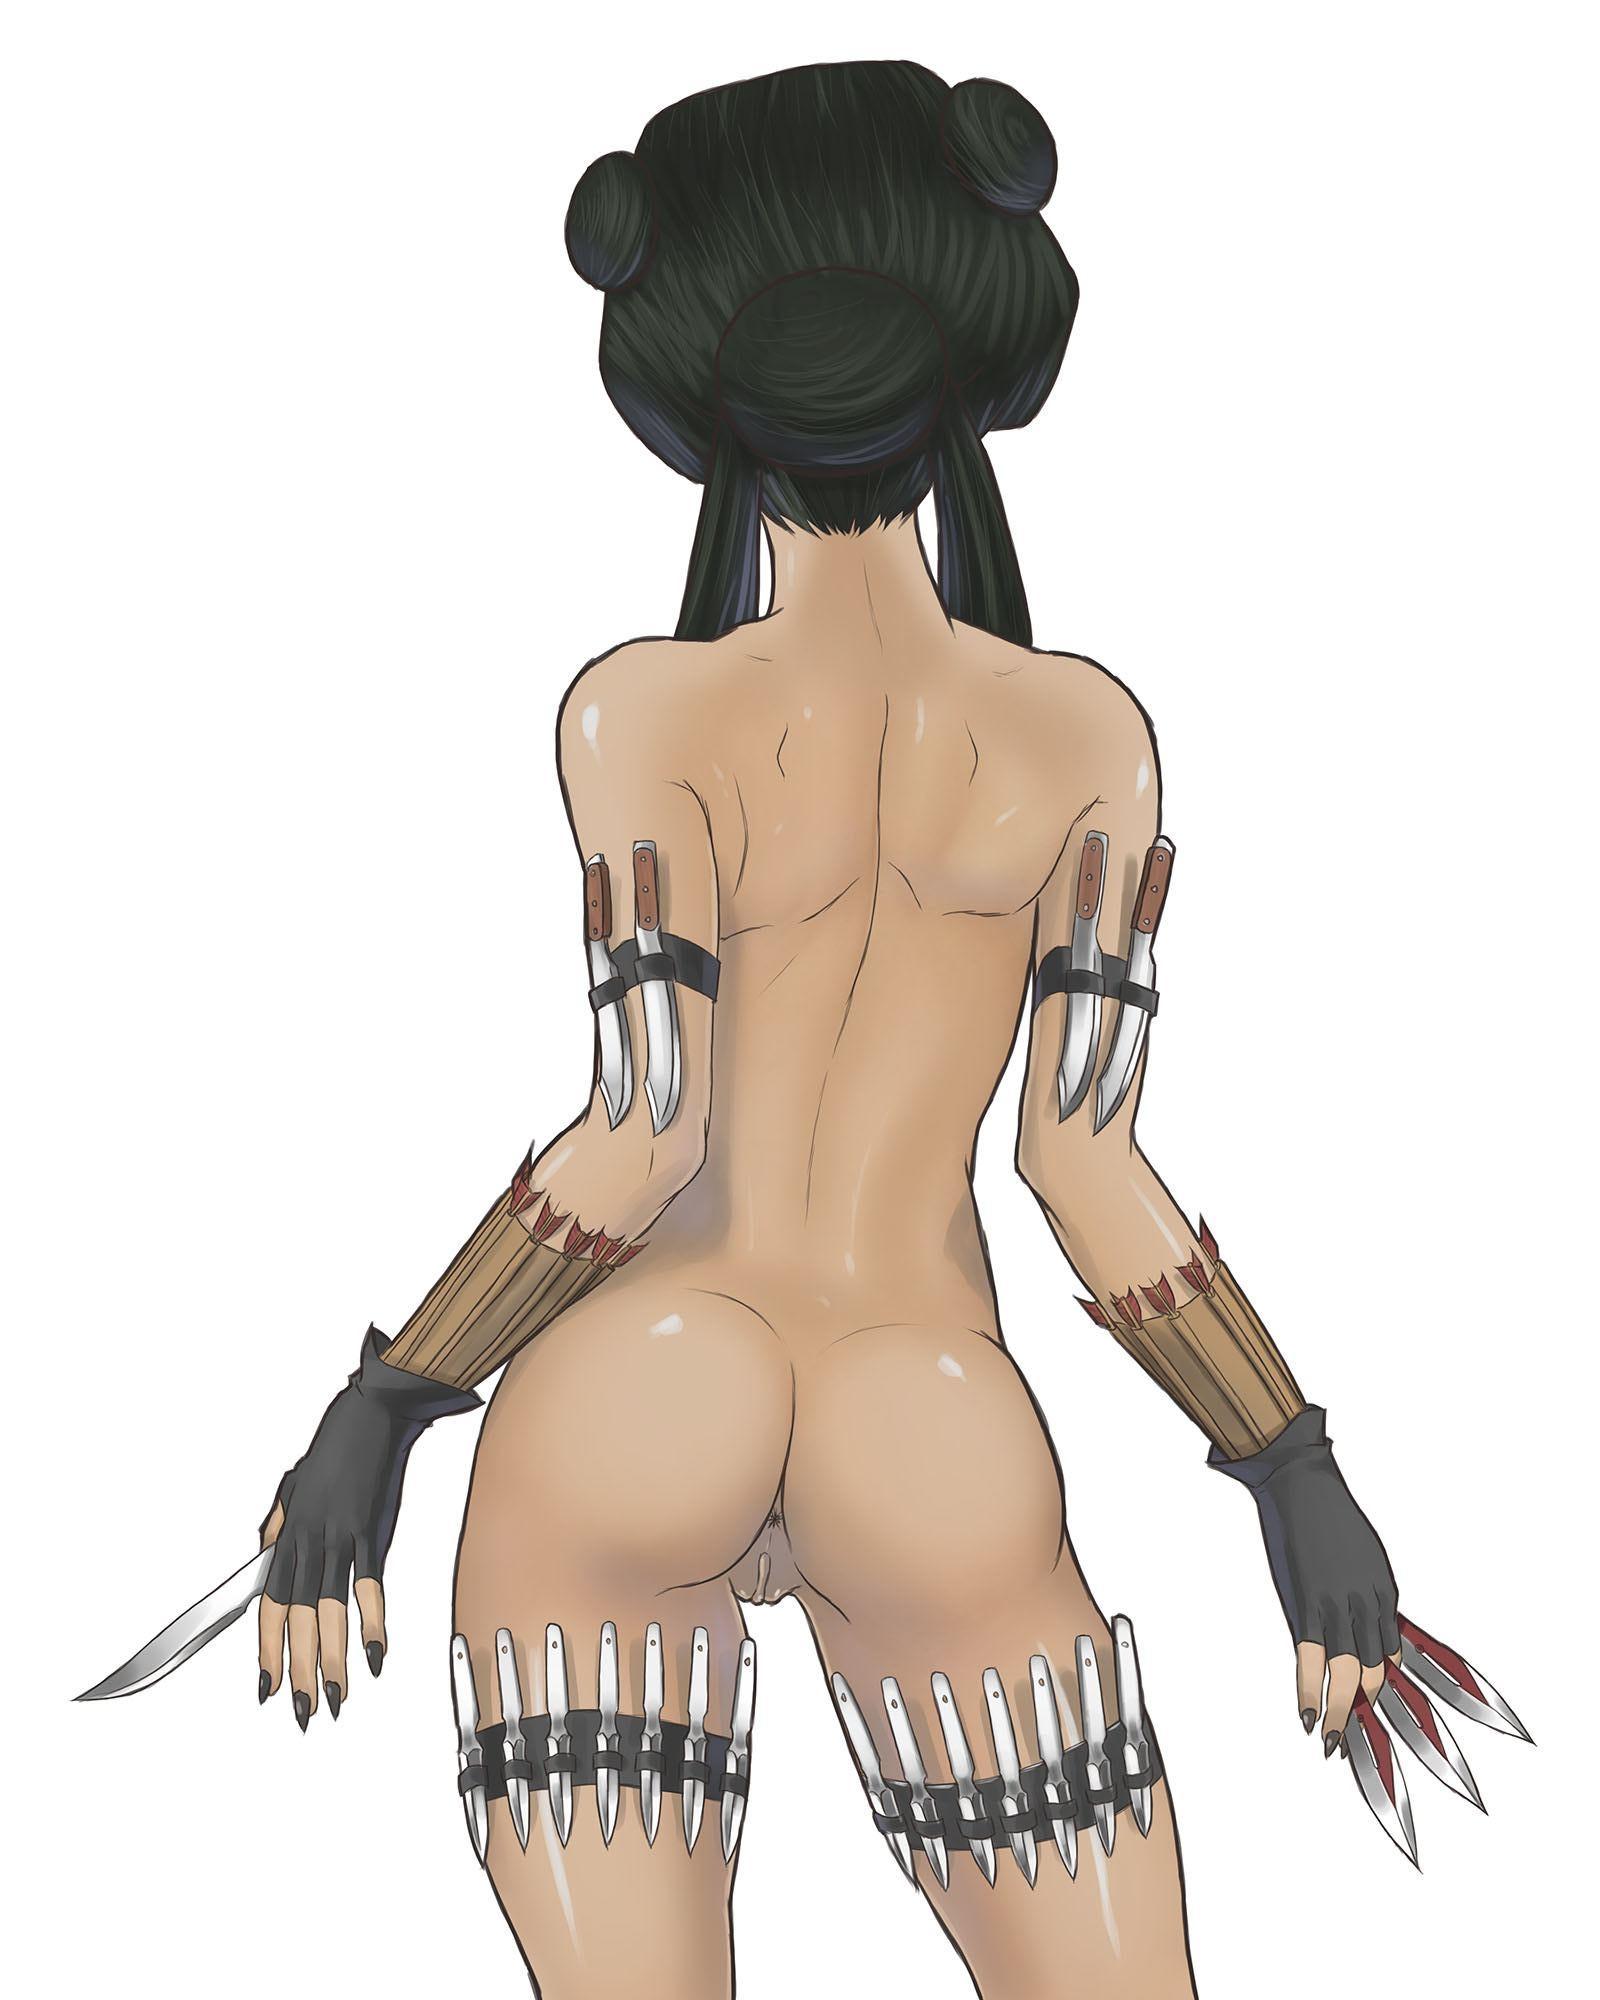 Avatar last airbender mai hentai